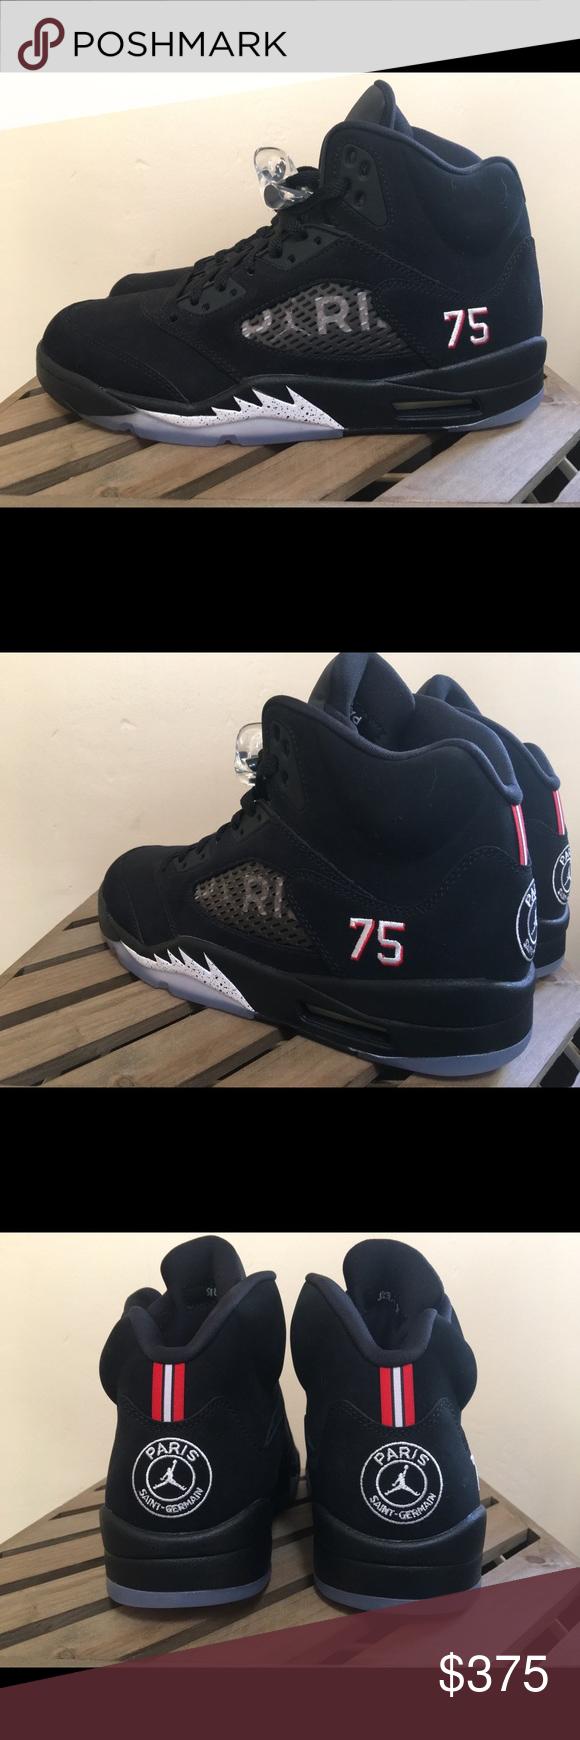 "604b6921272 Air Jordan 5 ""Paris Saint Germain"" Size 10 Brand new. Never worn. Jordan  Brand x Paris Saint Germain collab. Collector's edition."